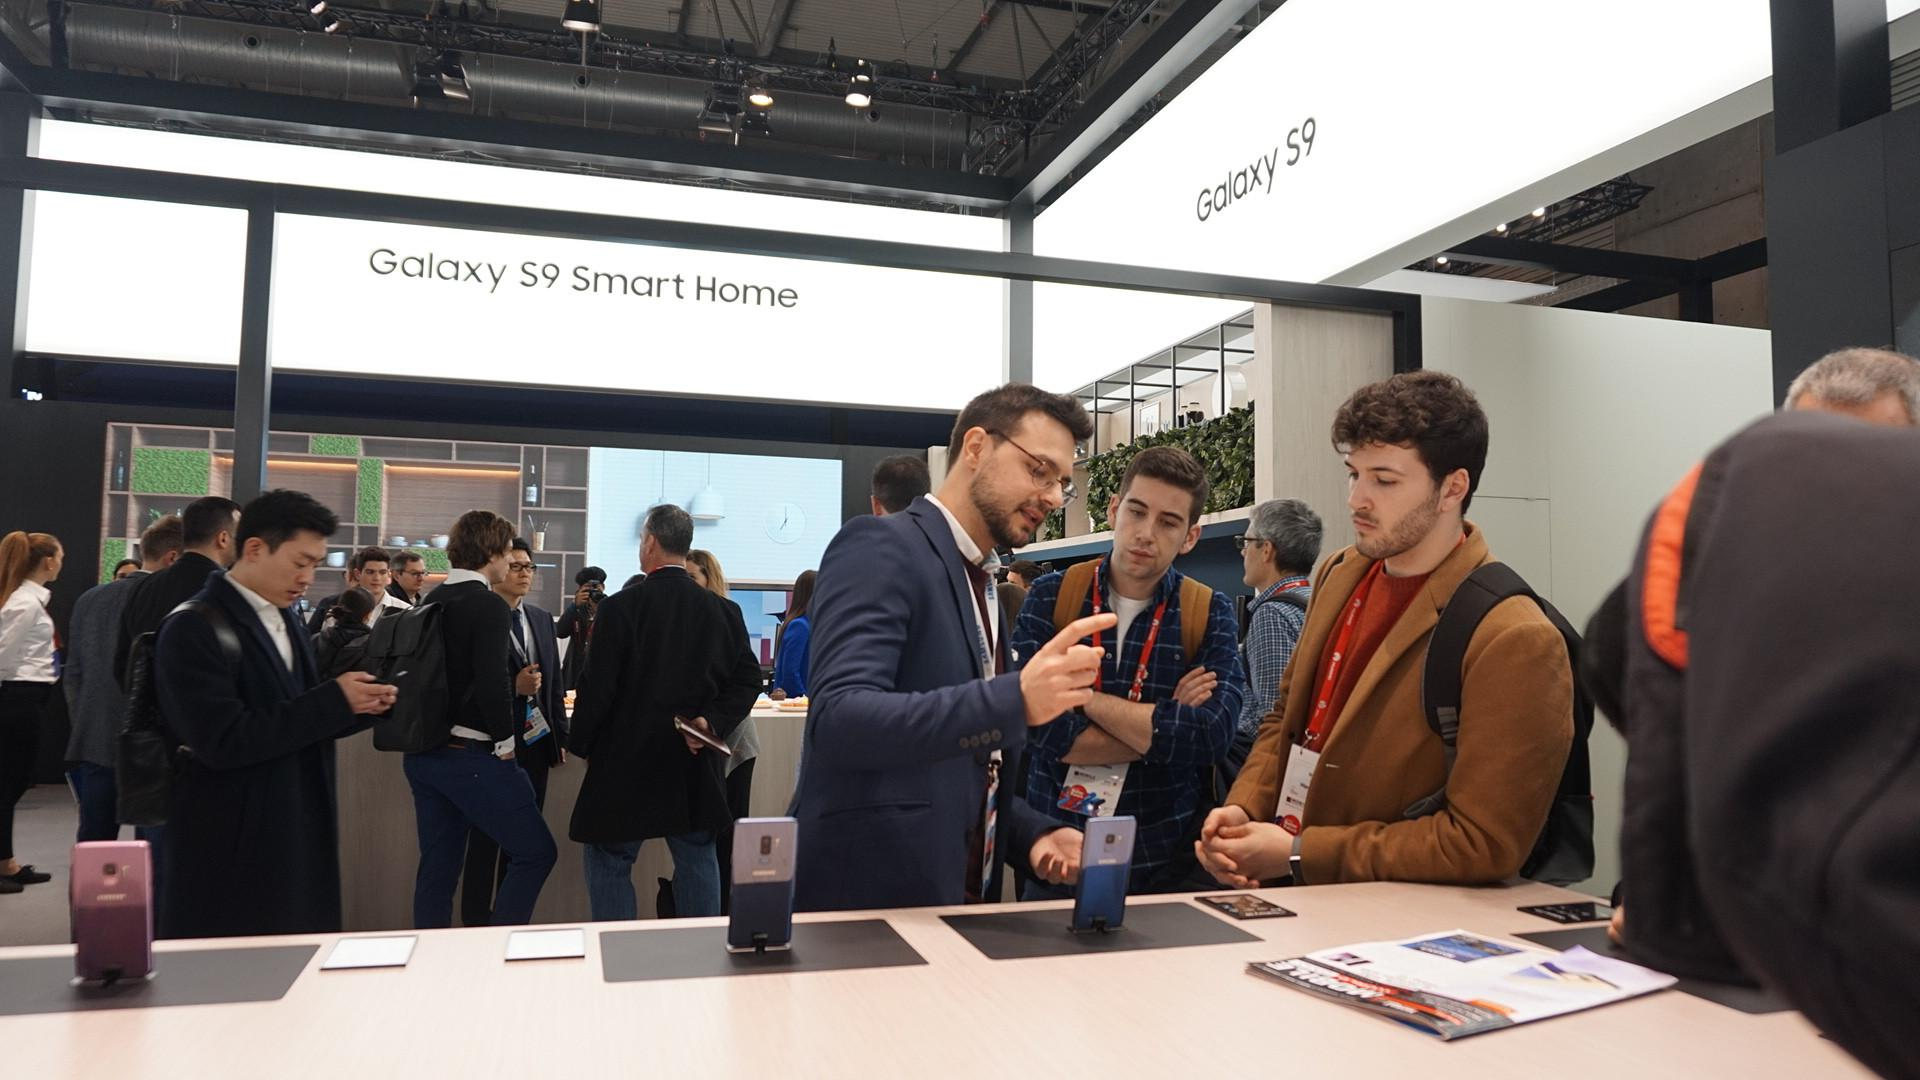 Antusiasme pengunjung di booth Samsung di gelaran Mobile World Congress 2018 (Liputan6.com/ Agustin Setyo W)